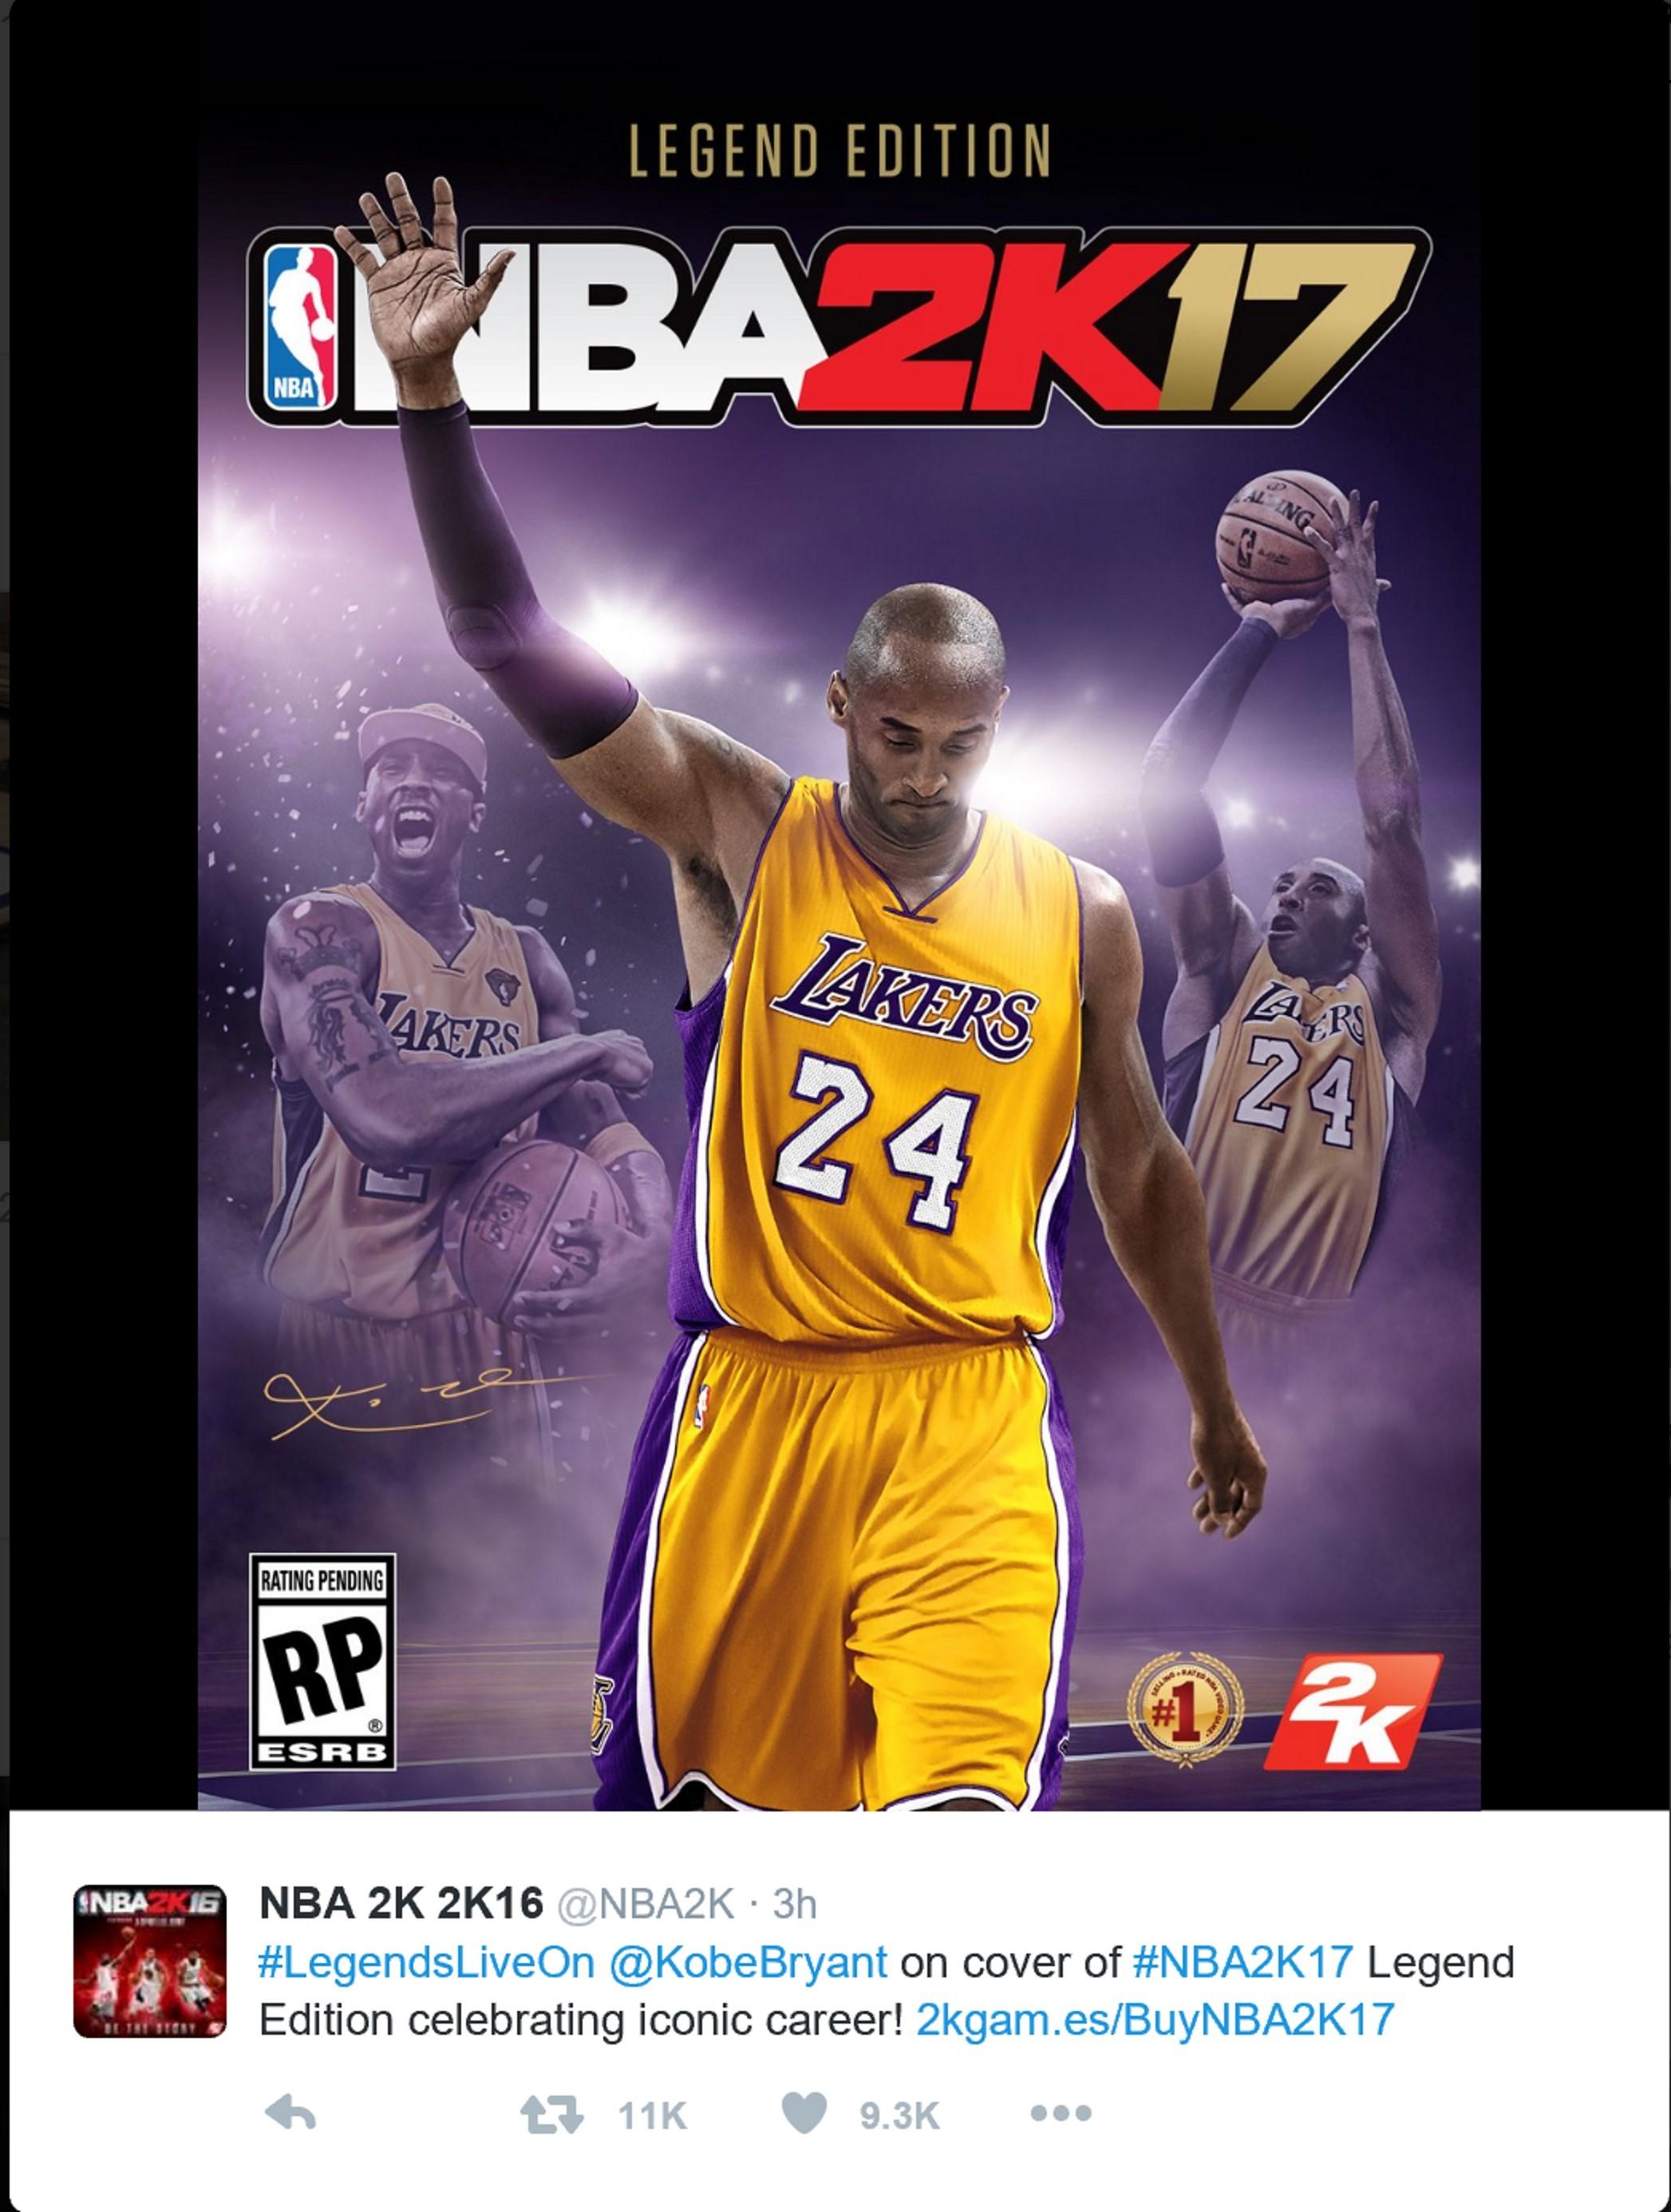 《NBA2K17》传奇版封面人物